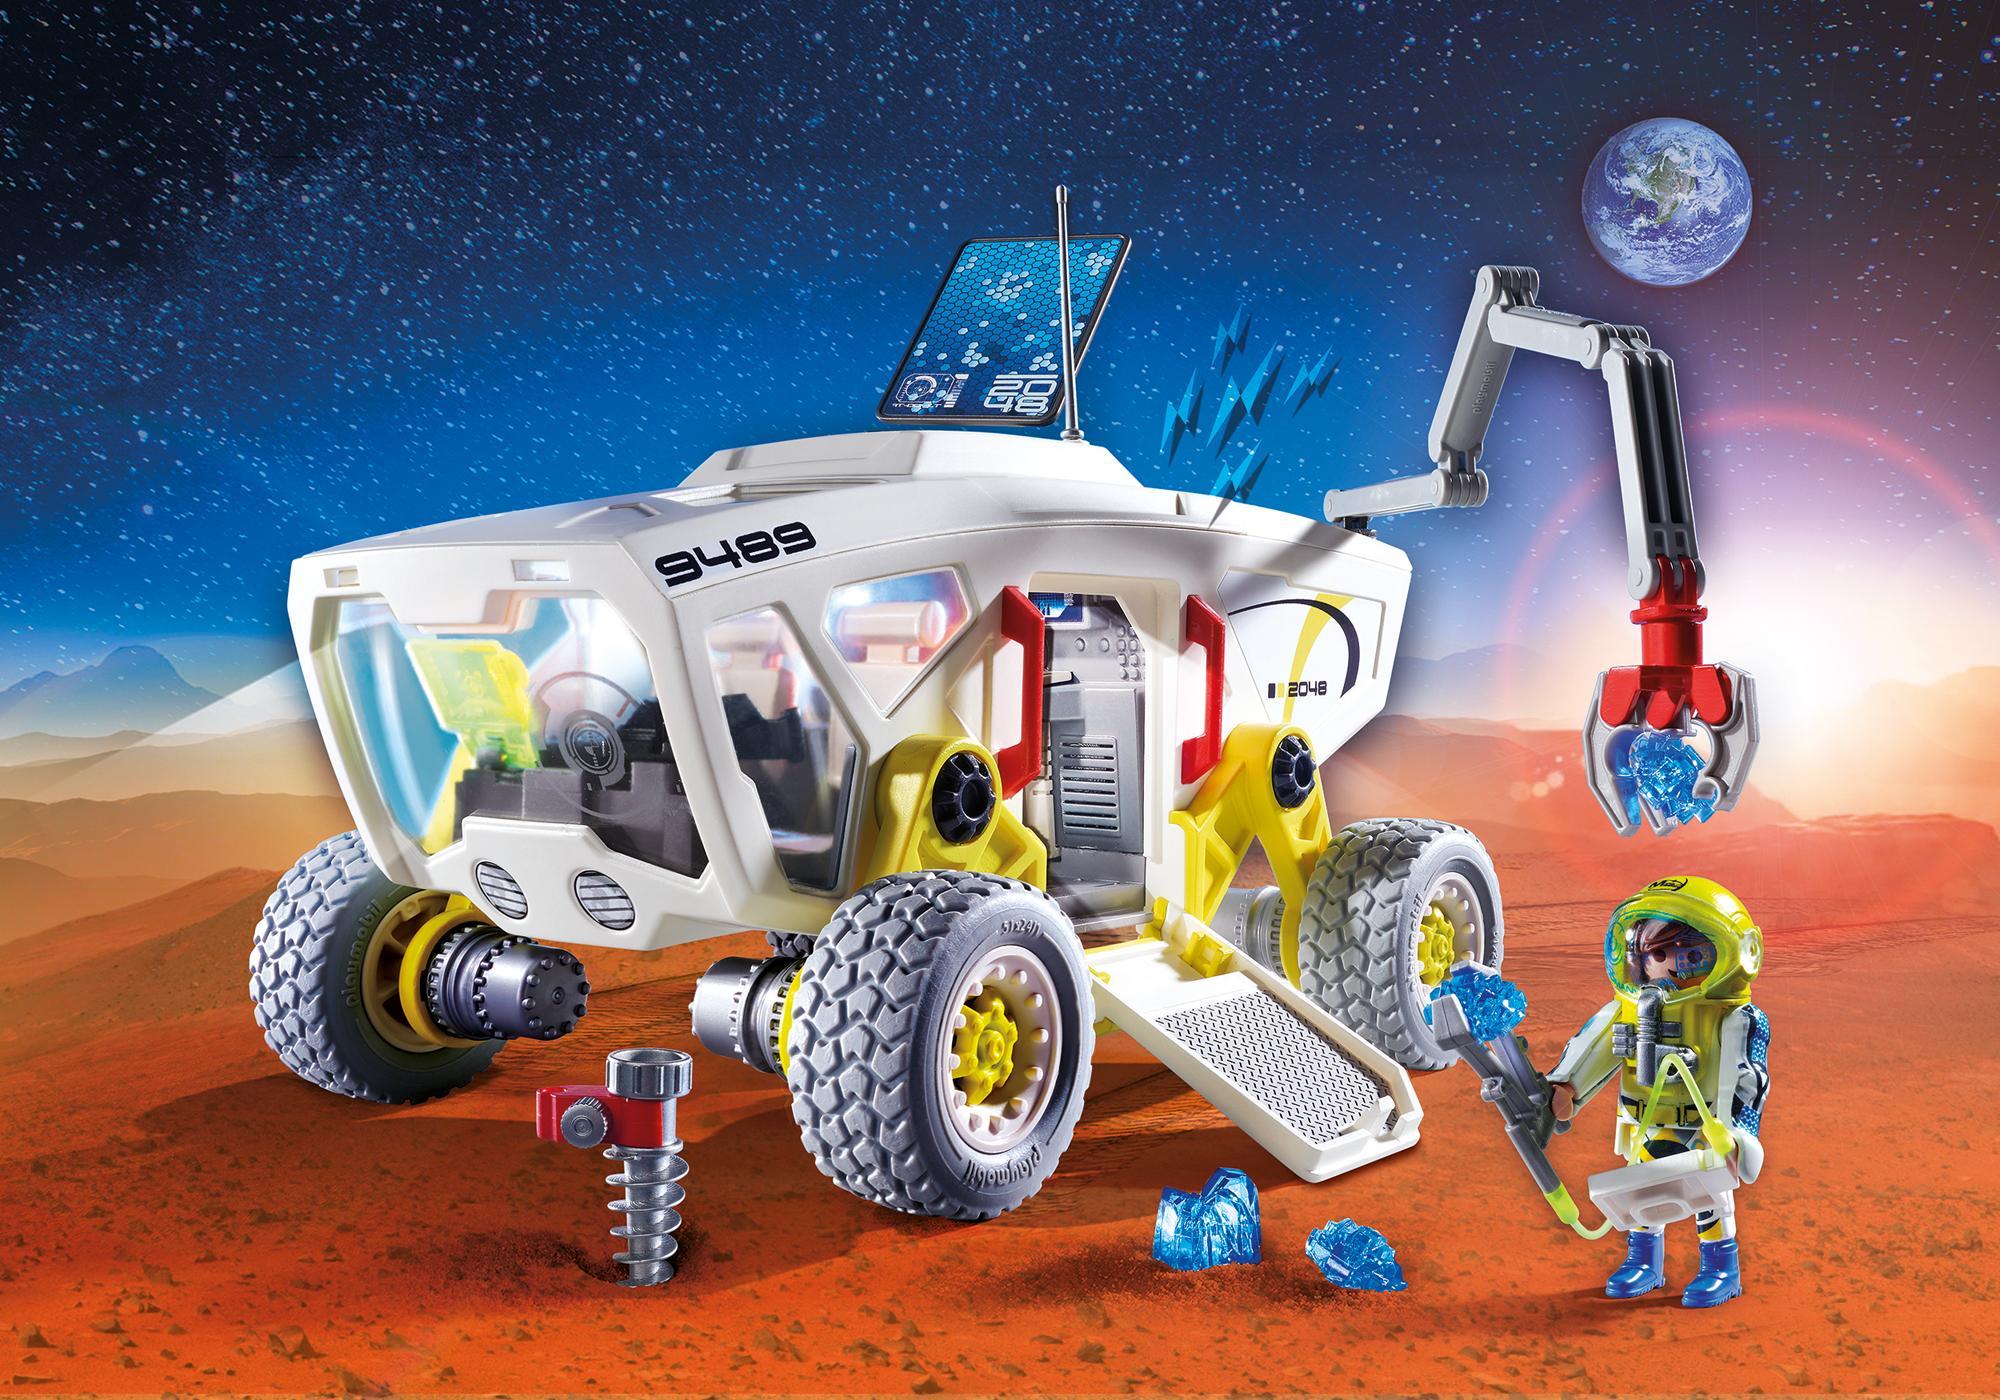 http://media.playmobil.com/i/playmobil/9489_product_detail/Mars udforskningskøretøj